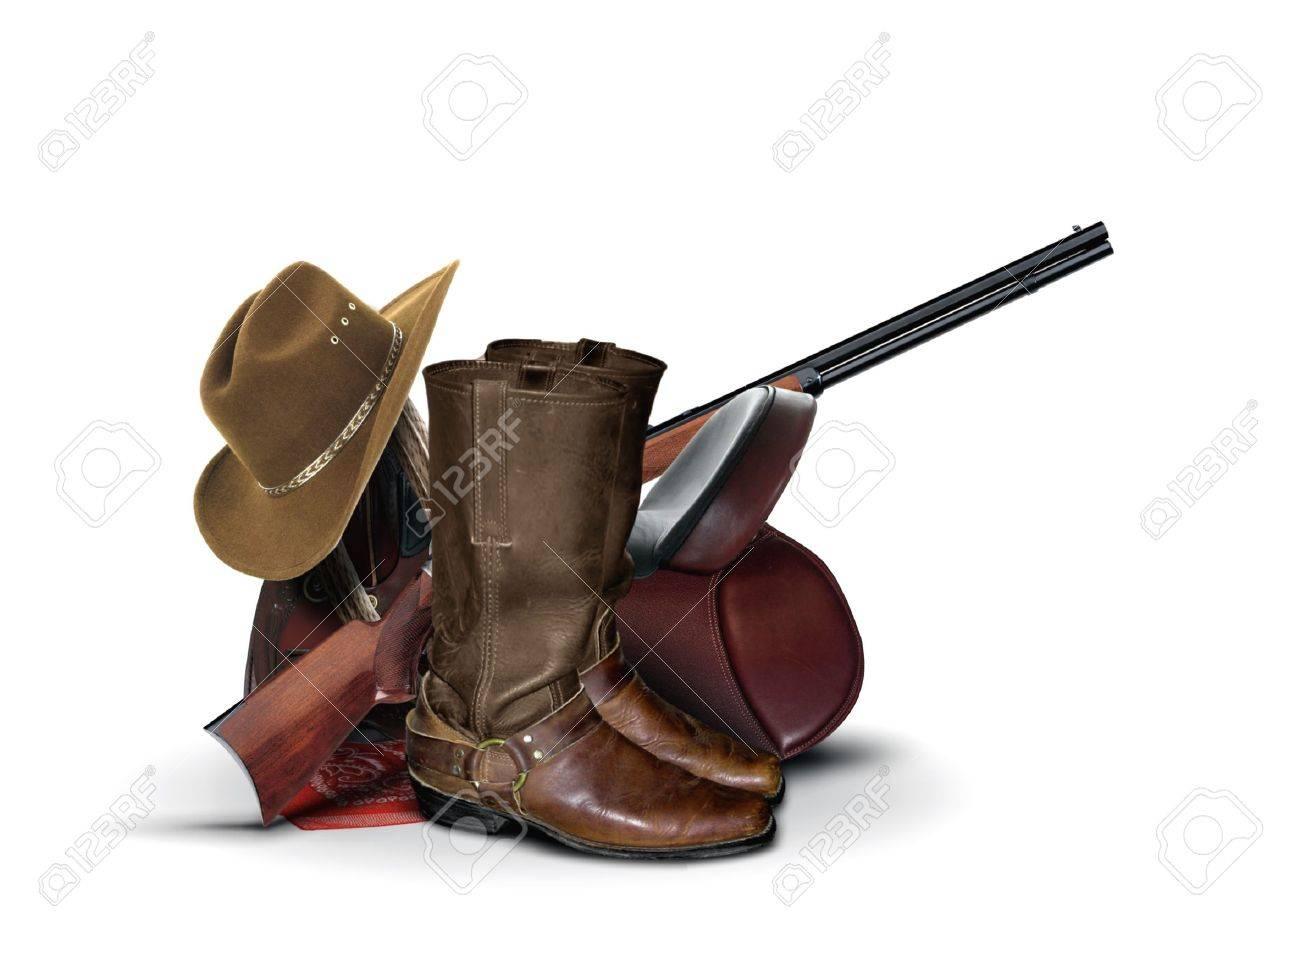 Cowboy Equipment over White - 26245359